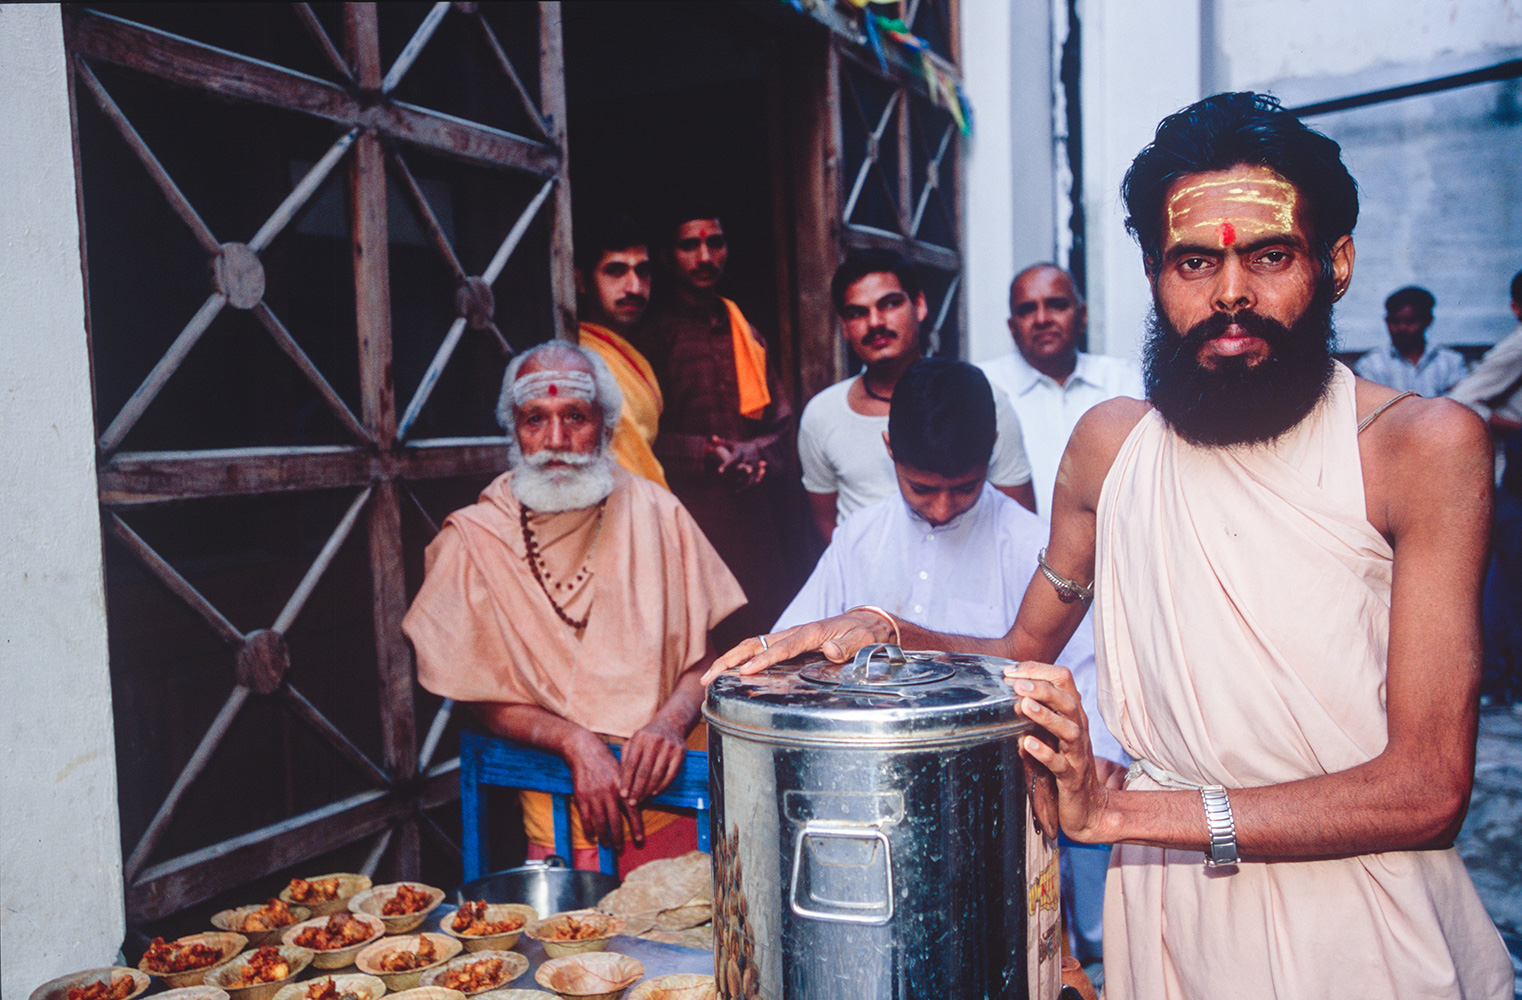 haridwar_ashram_breakfast_2004RVP